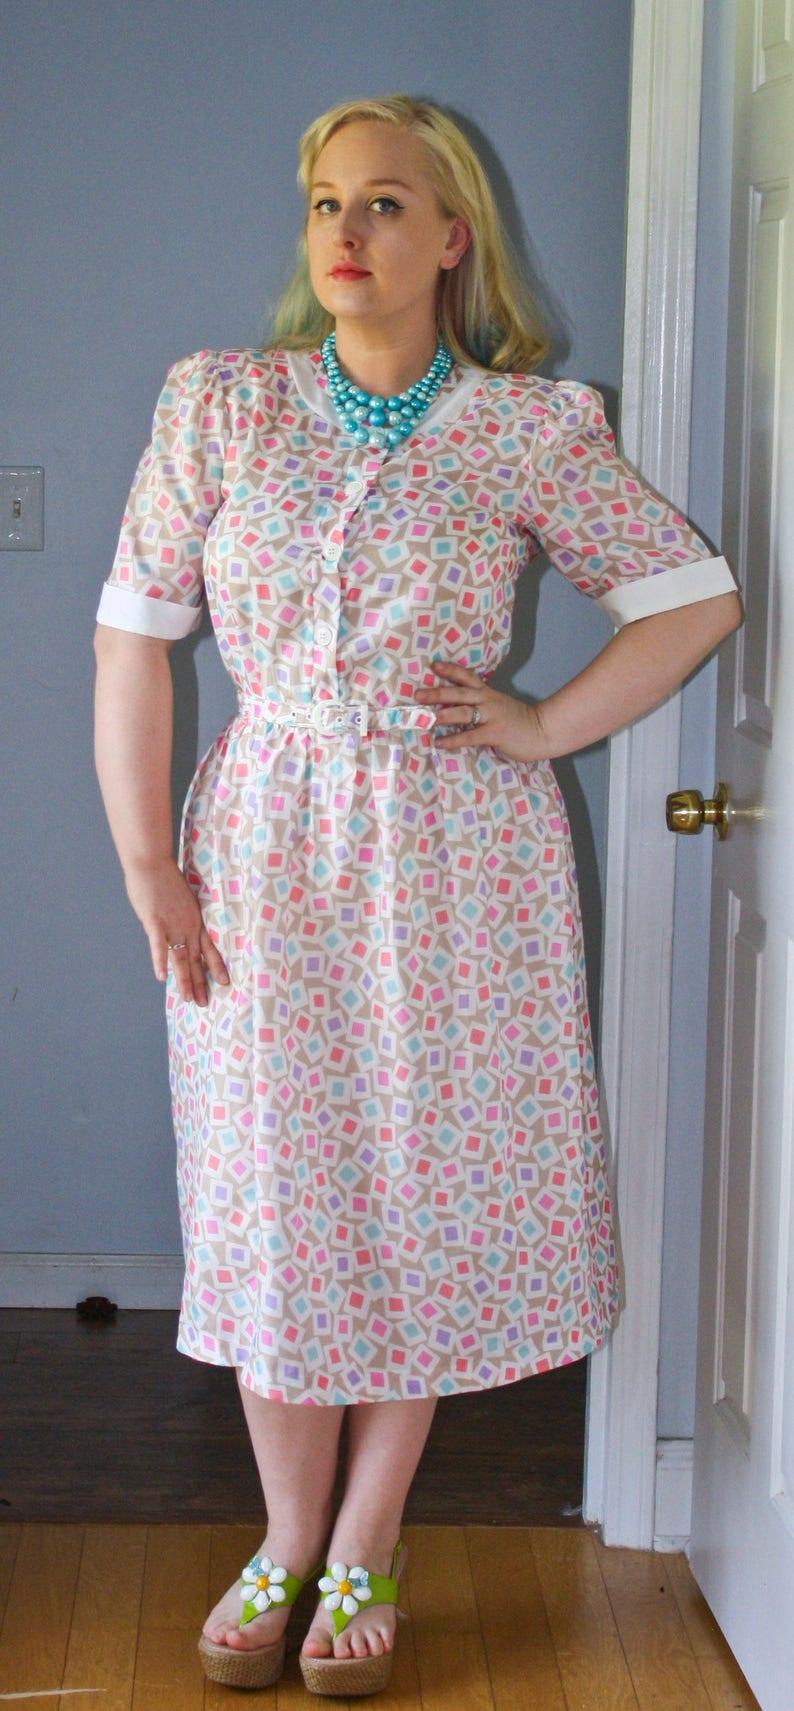 SALE 1980s Golden Girls Granny Old Lady Halloween Secretary Dress  Shirtwaist Plus Size Multi Square Geometric Novelty Print waist 33\